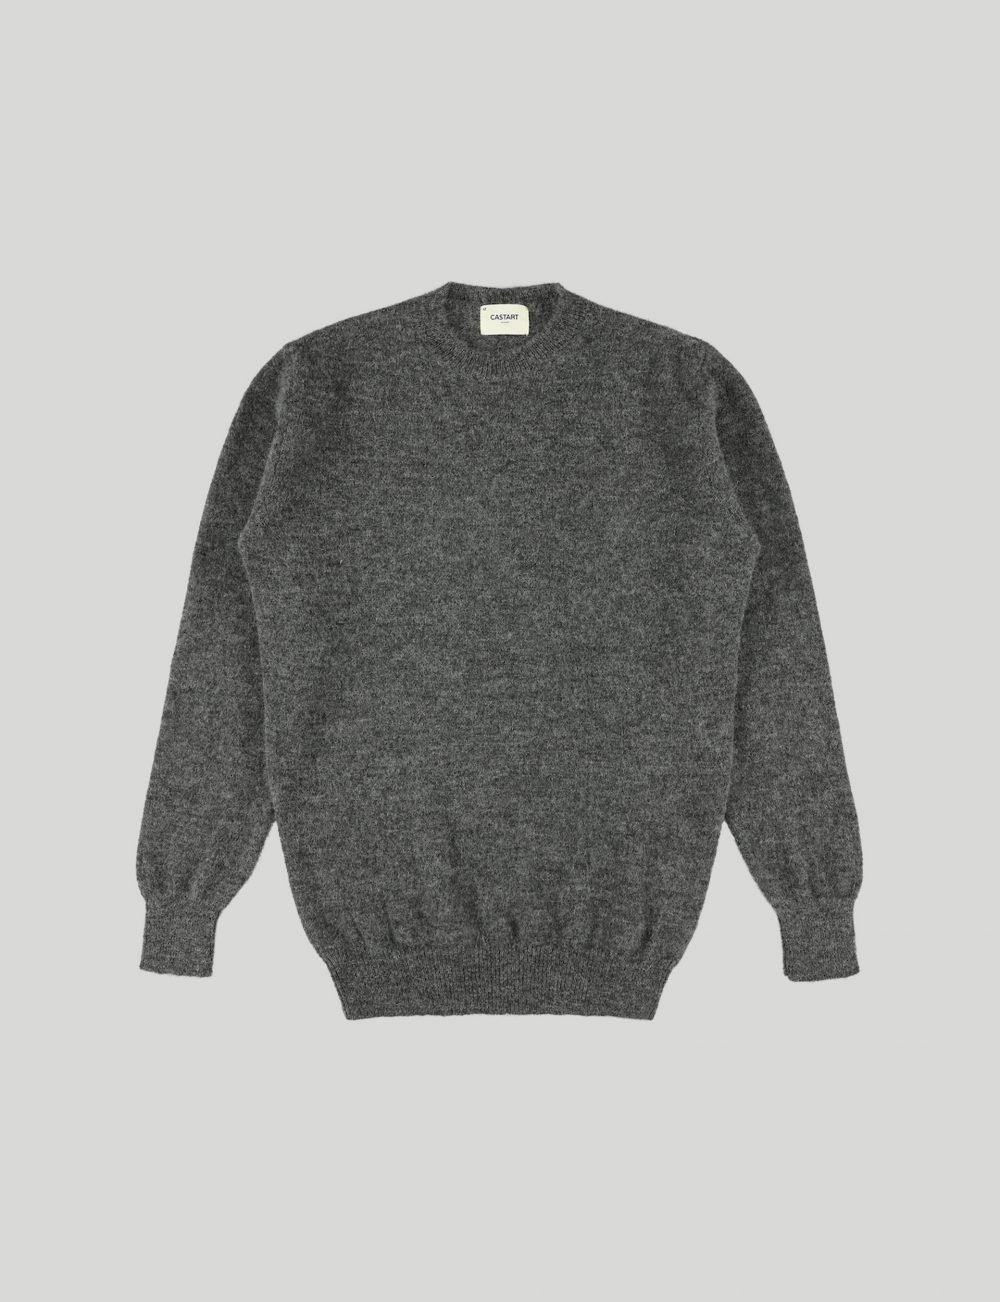 Castart - The Flirt Knitwear - Dark Grey